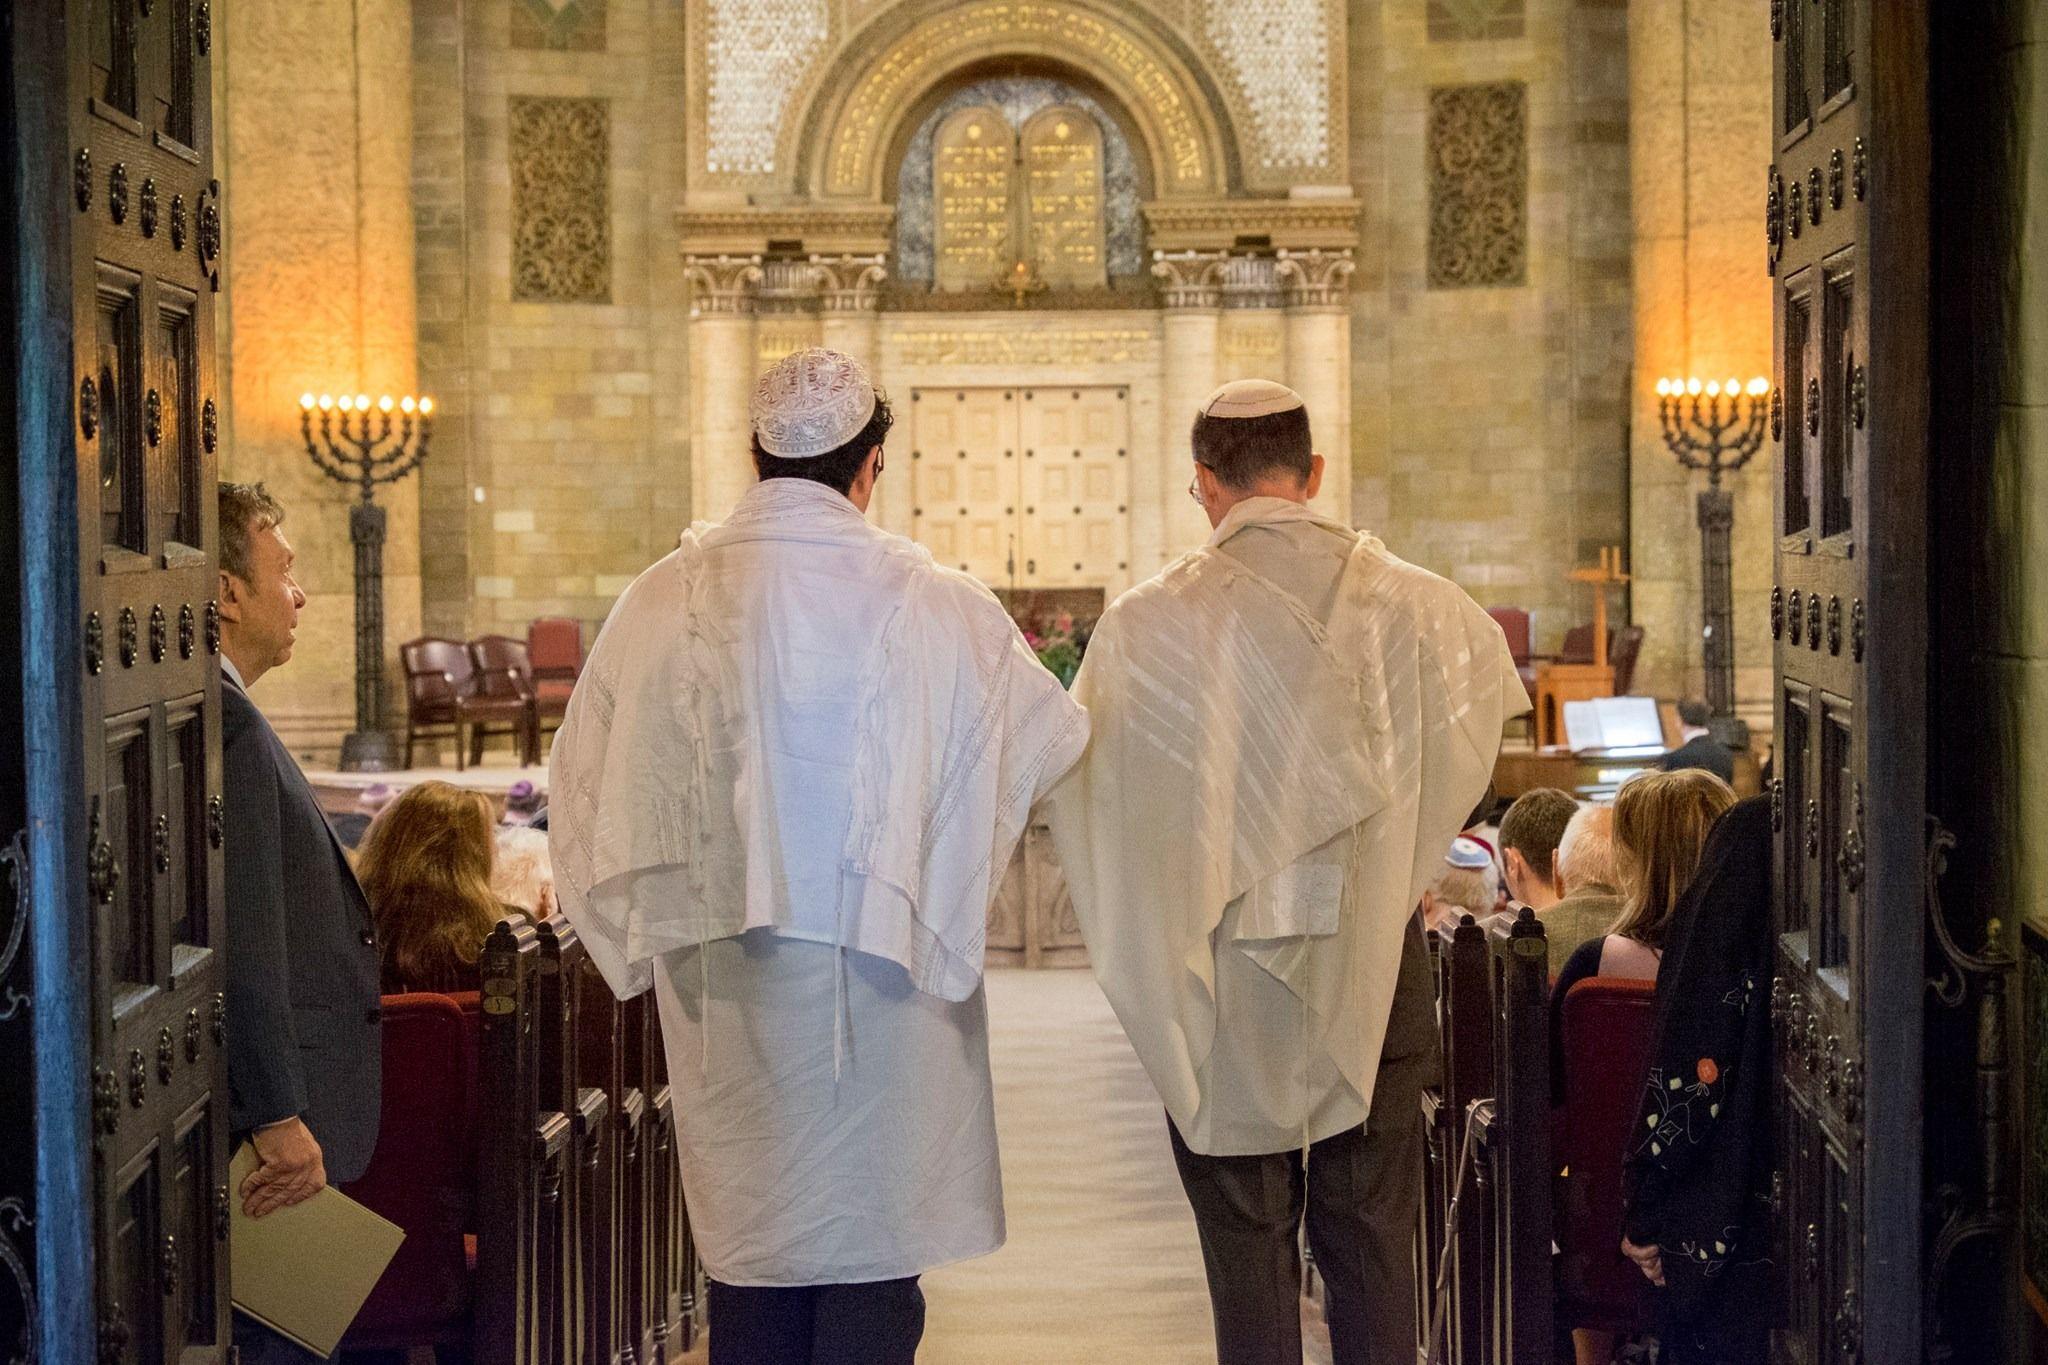 KAM Isaiah Israel - Chicago, IL – The Forward